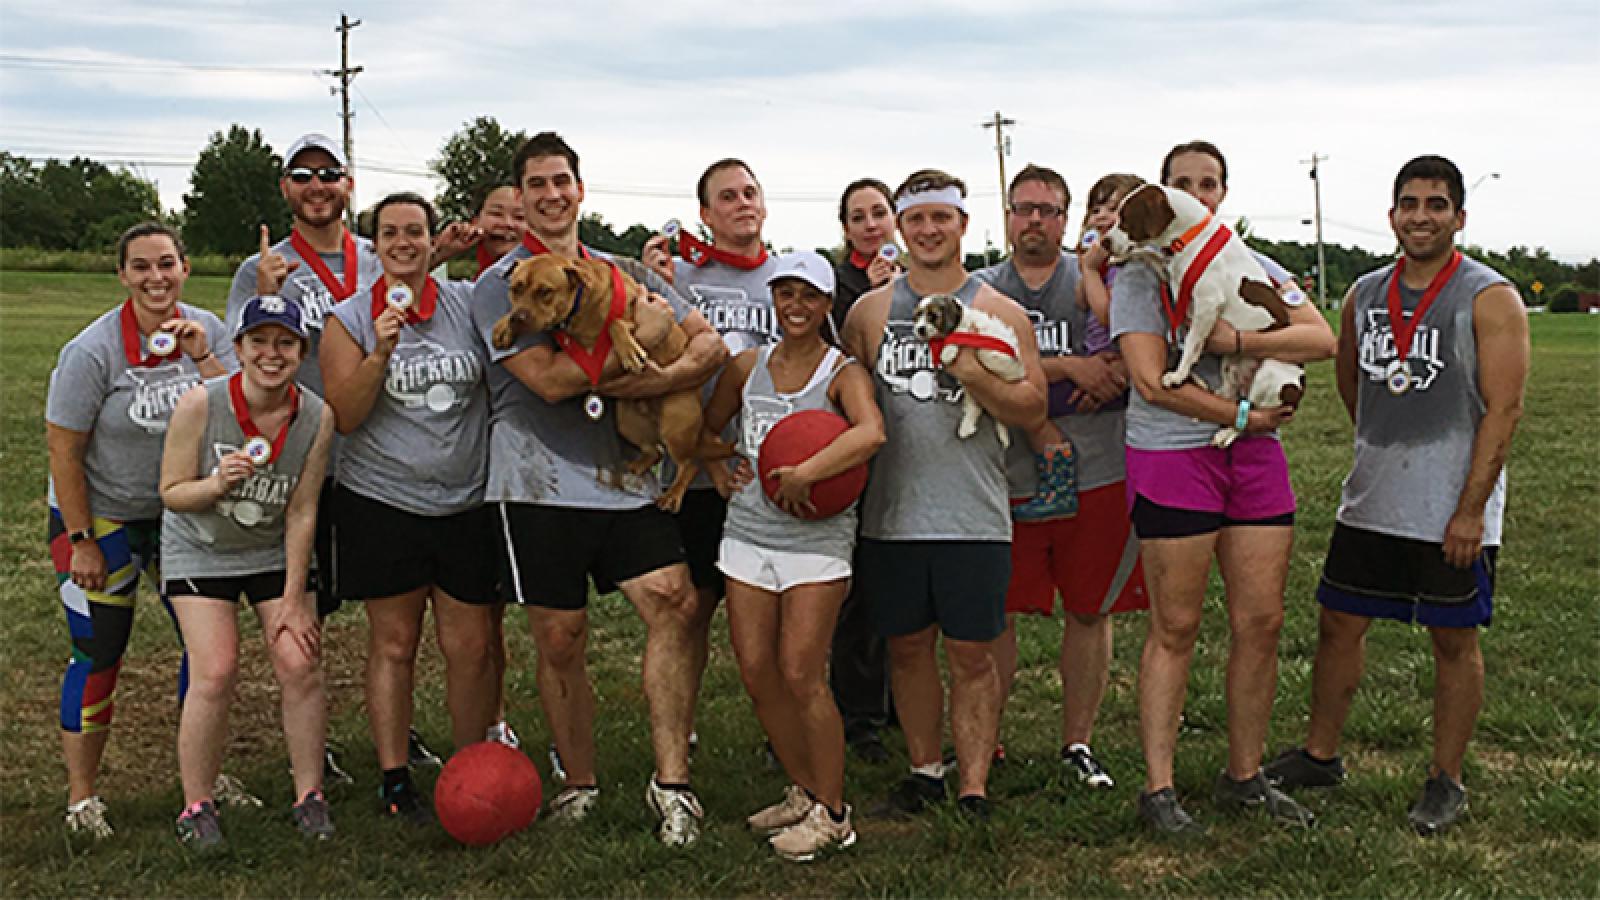 Pediatrics Team Kickball champs